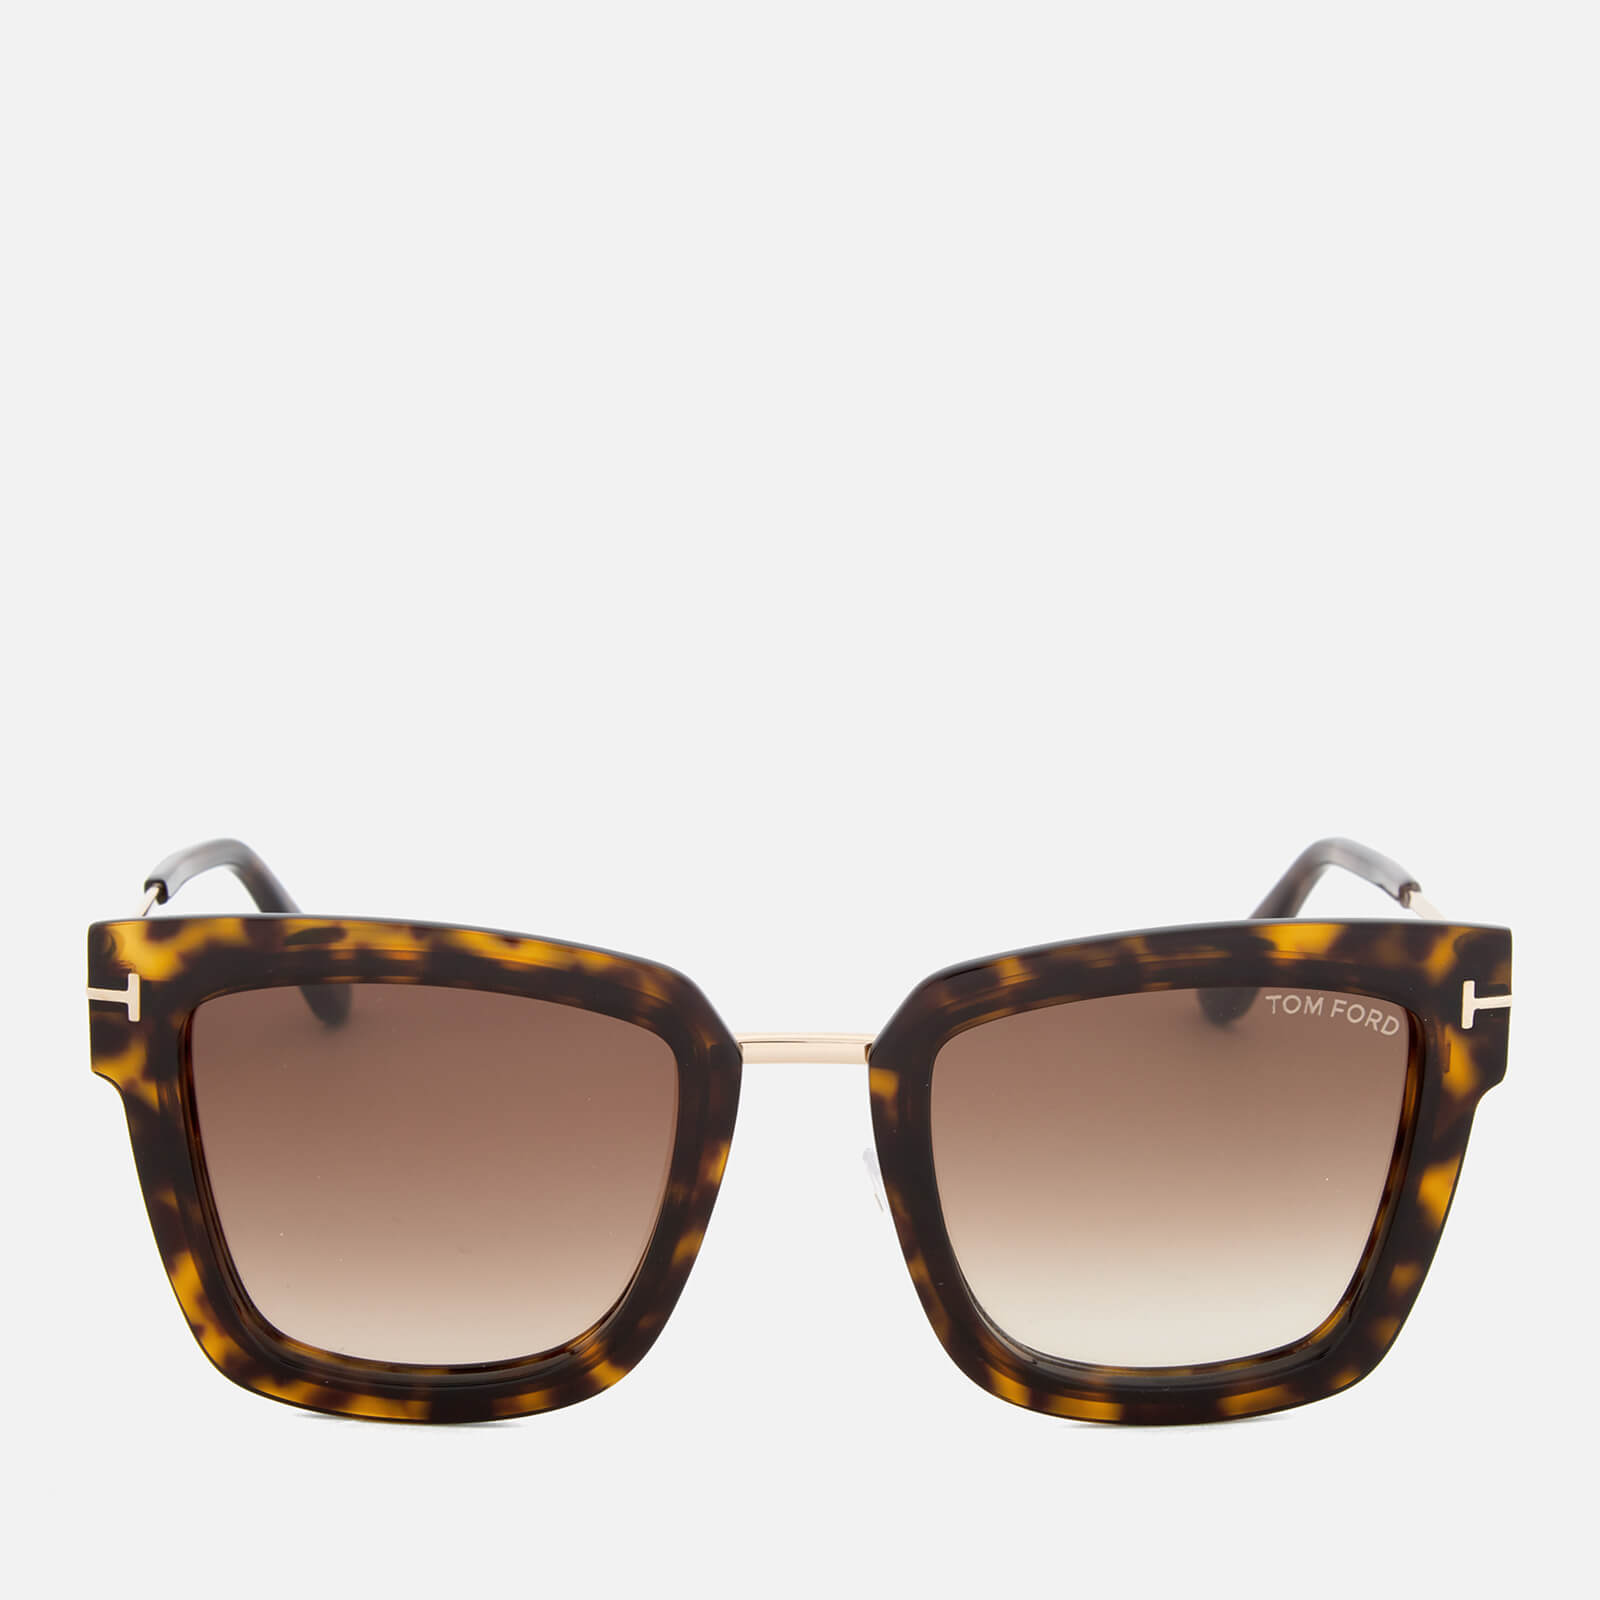 112461ea76b Tom Ford Women s Lara Square Frame Sunglasses - Dark Havana - Free UK  Delivery over £50